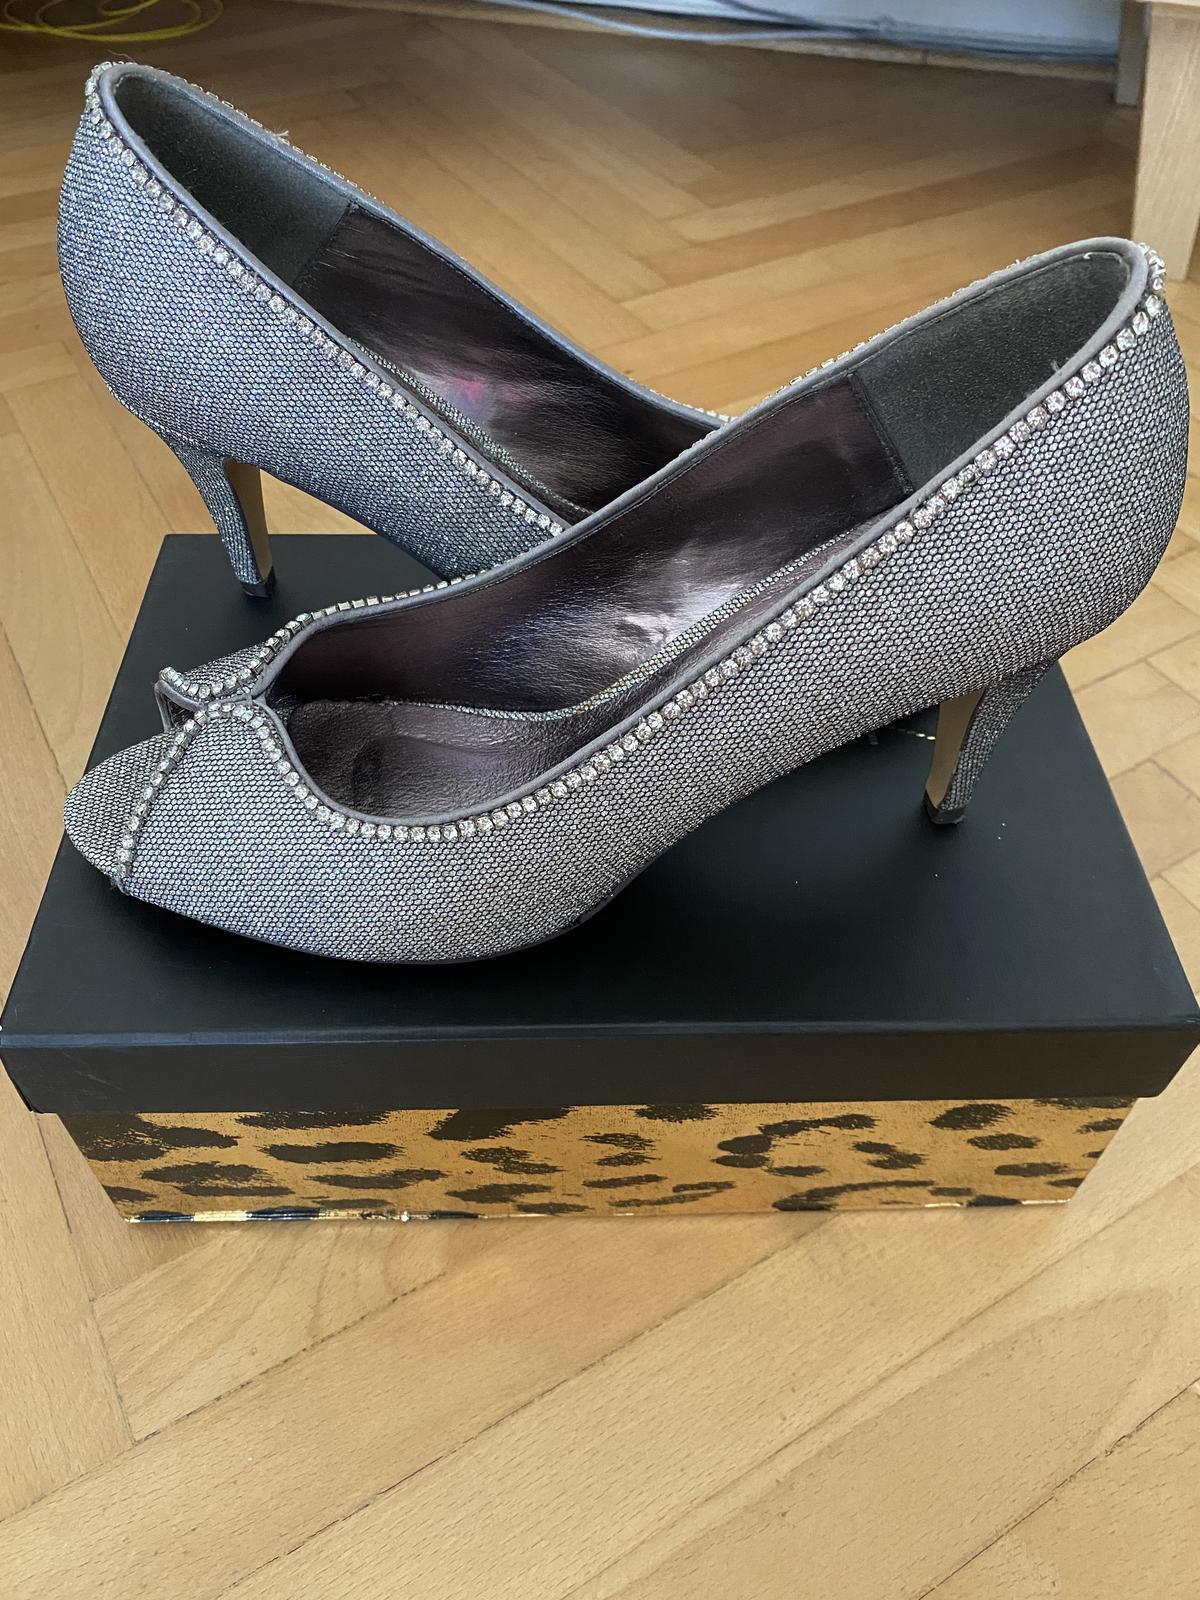 strieborné topánky - Obrázok č. 1